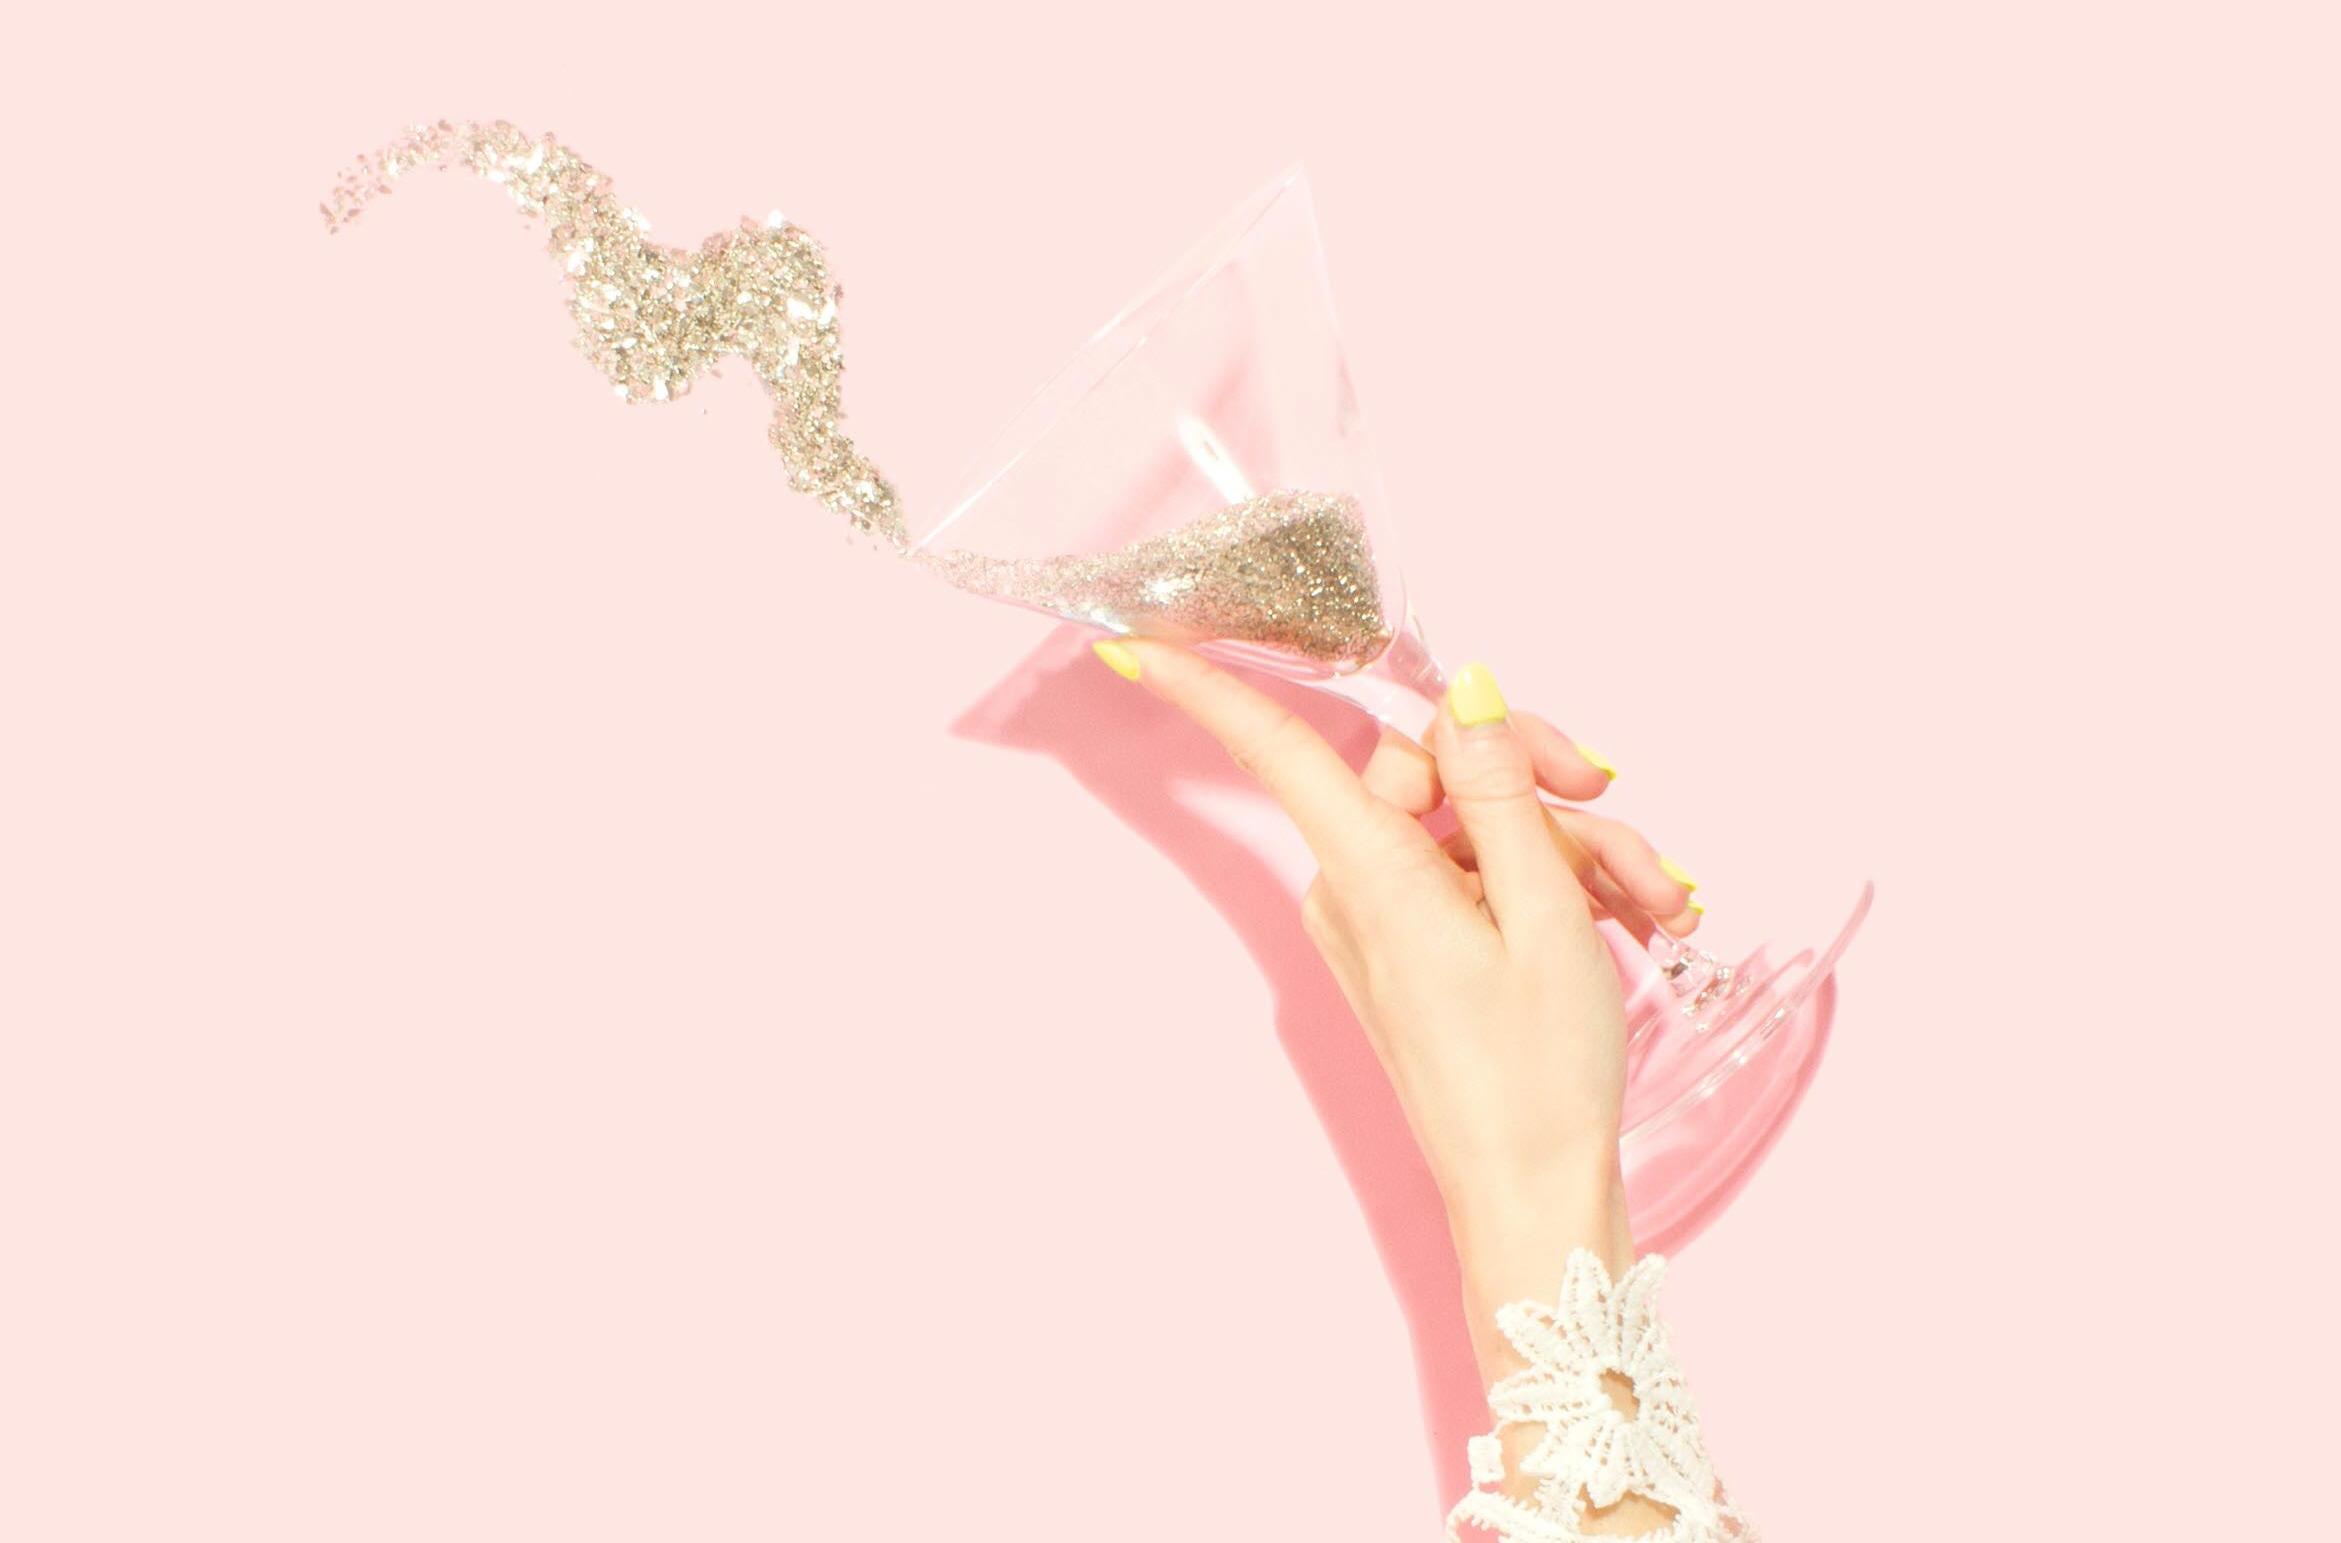 Fondos de pantalla para fanáticas del color rosa